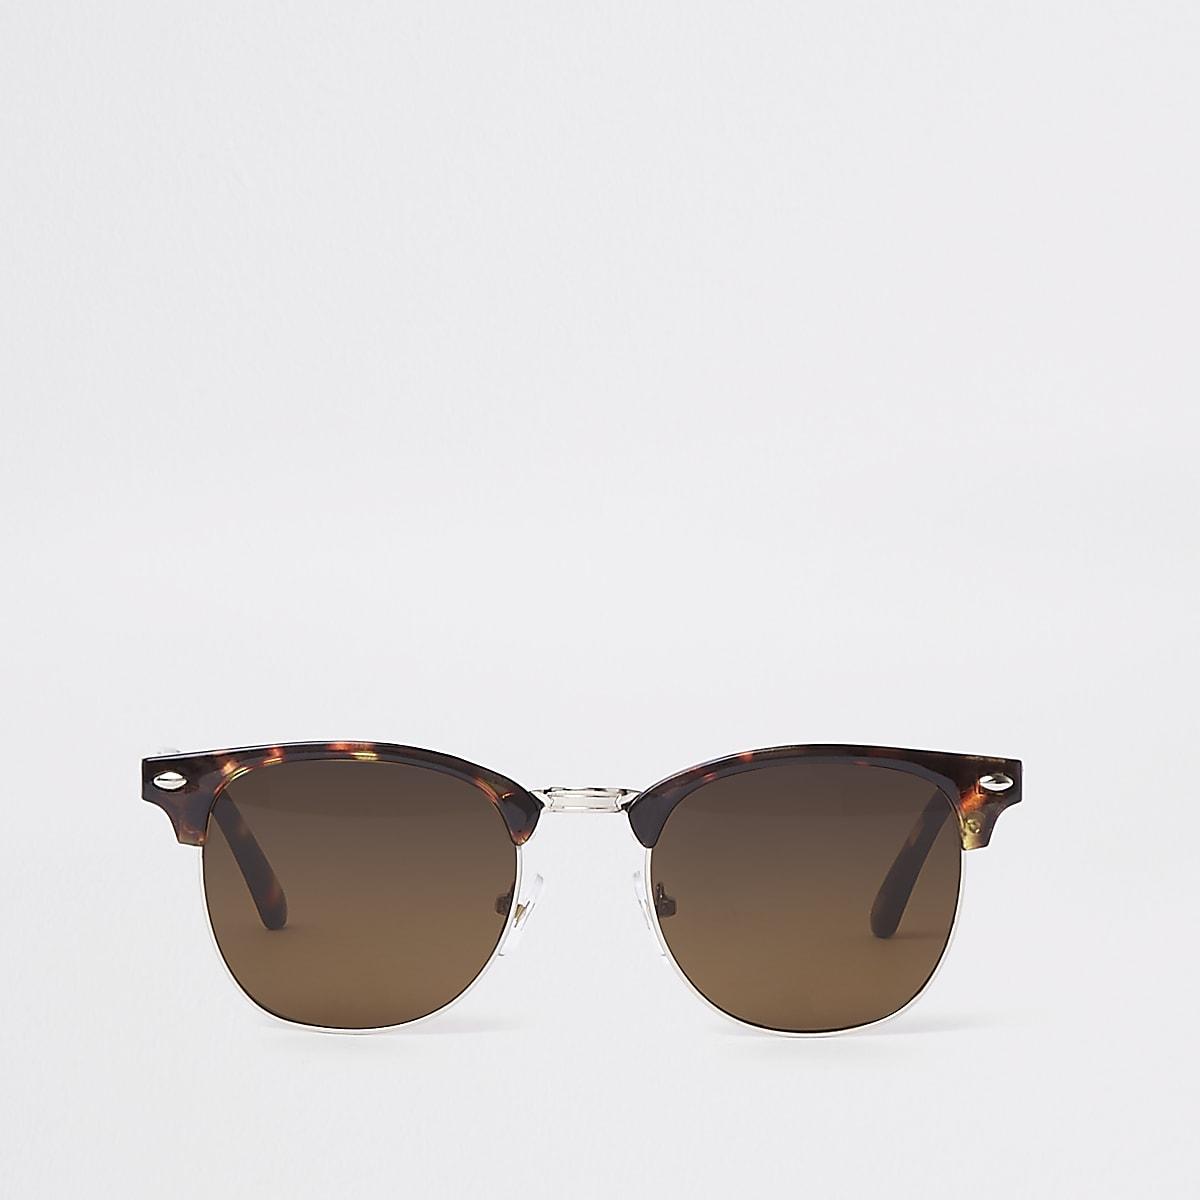 Brown half frame tortoiseshell sunglasses